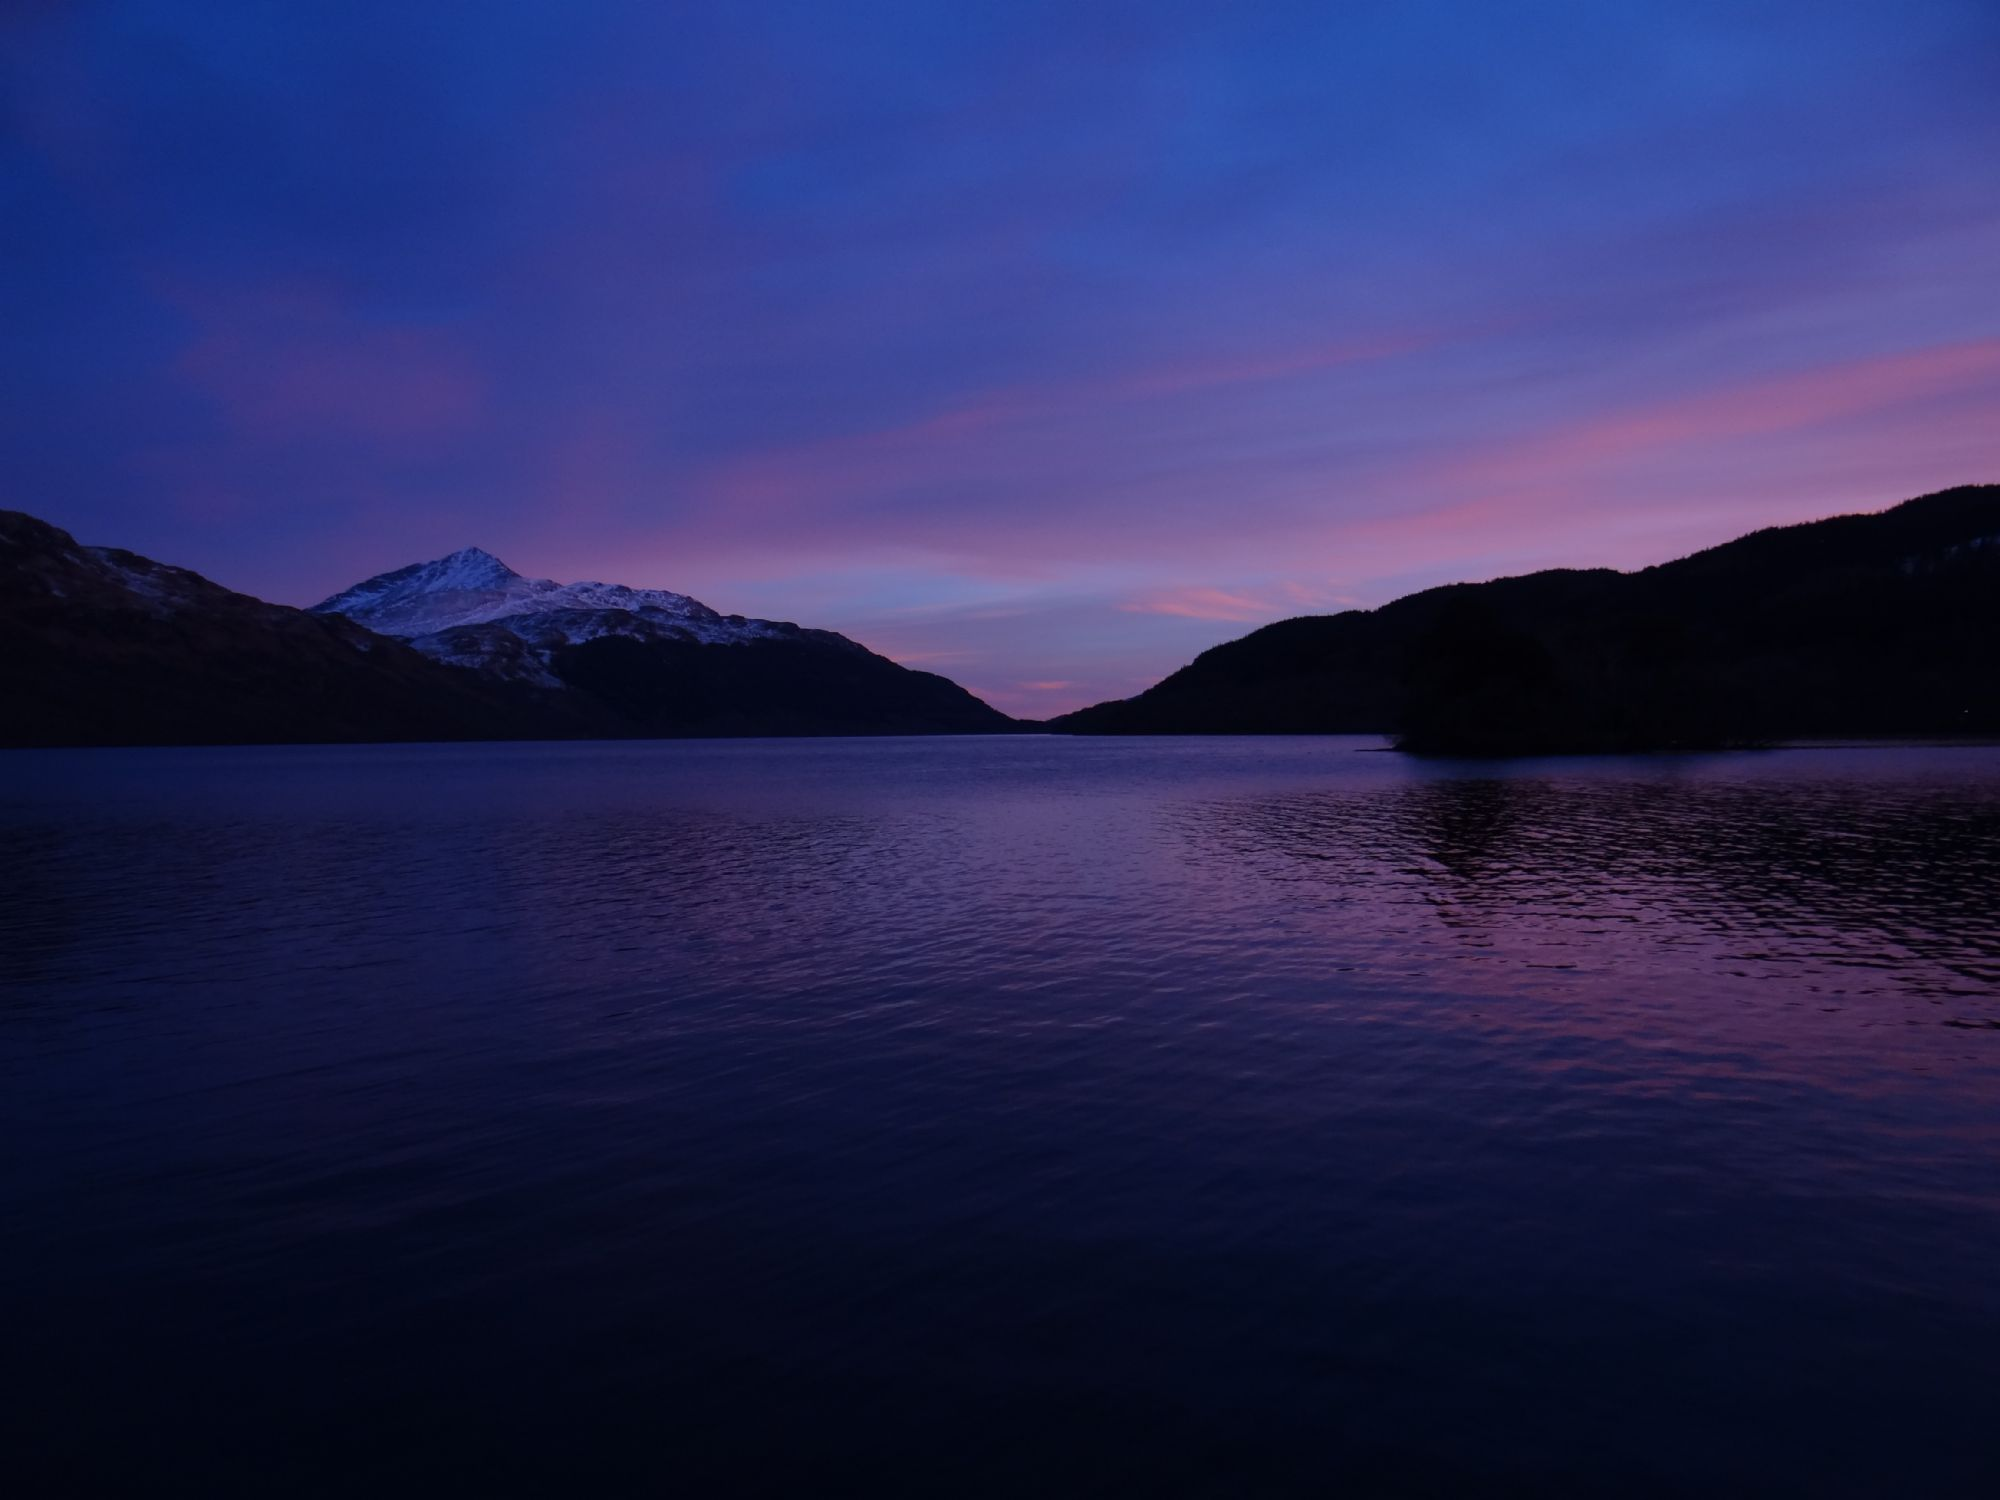 Lights of the Loch Lomond 2